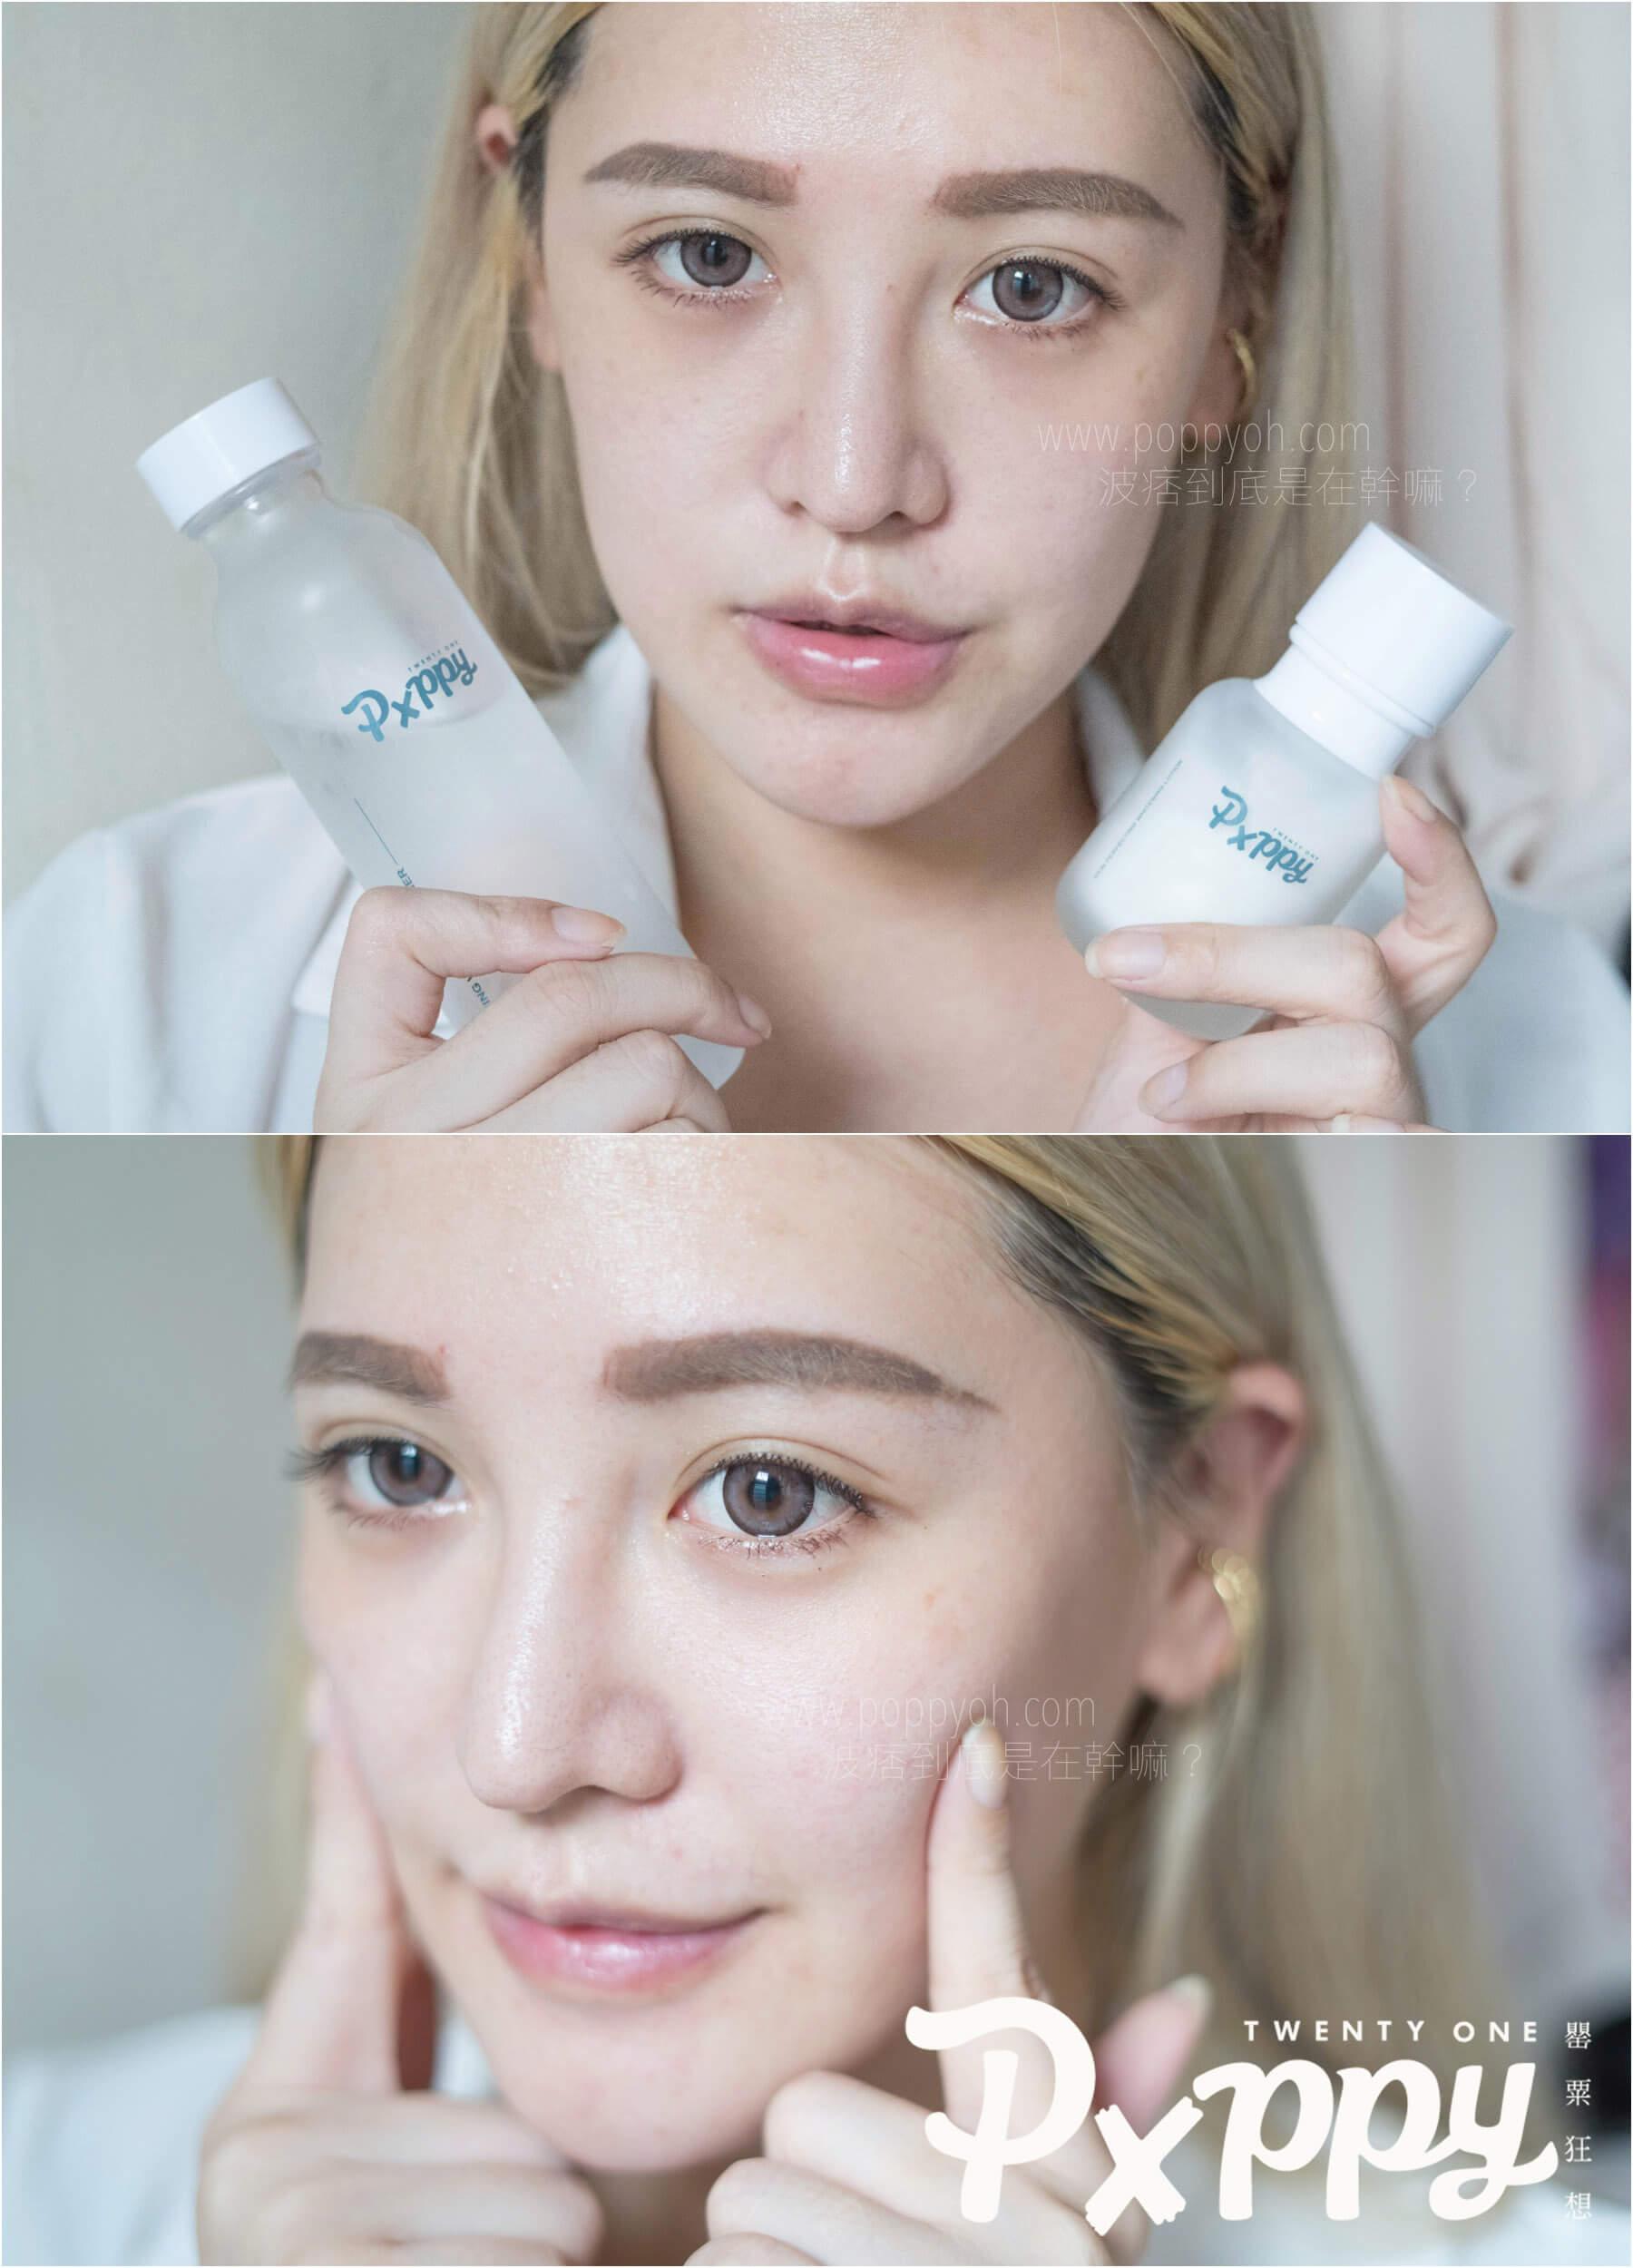 Poppy21 毛孔收斂化妝水 好用嗎